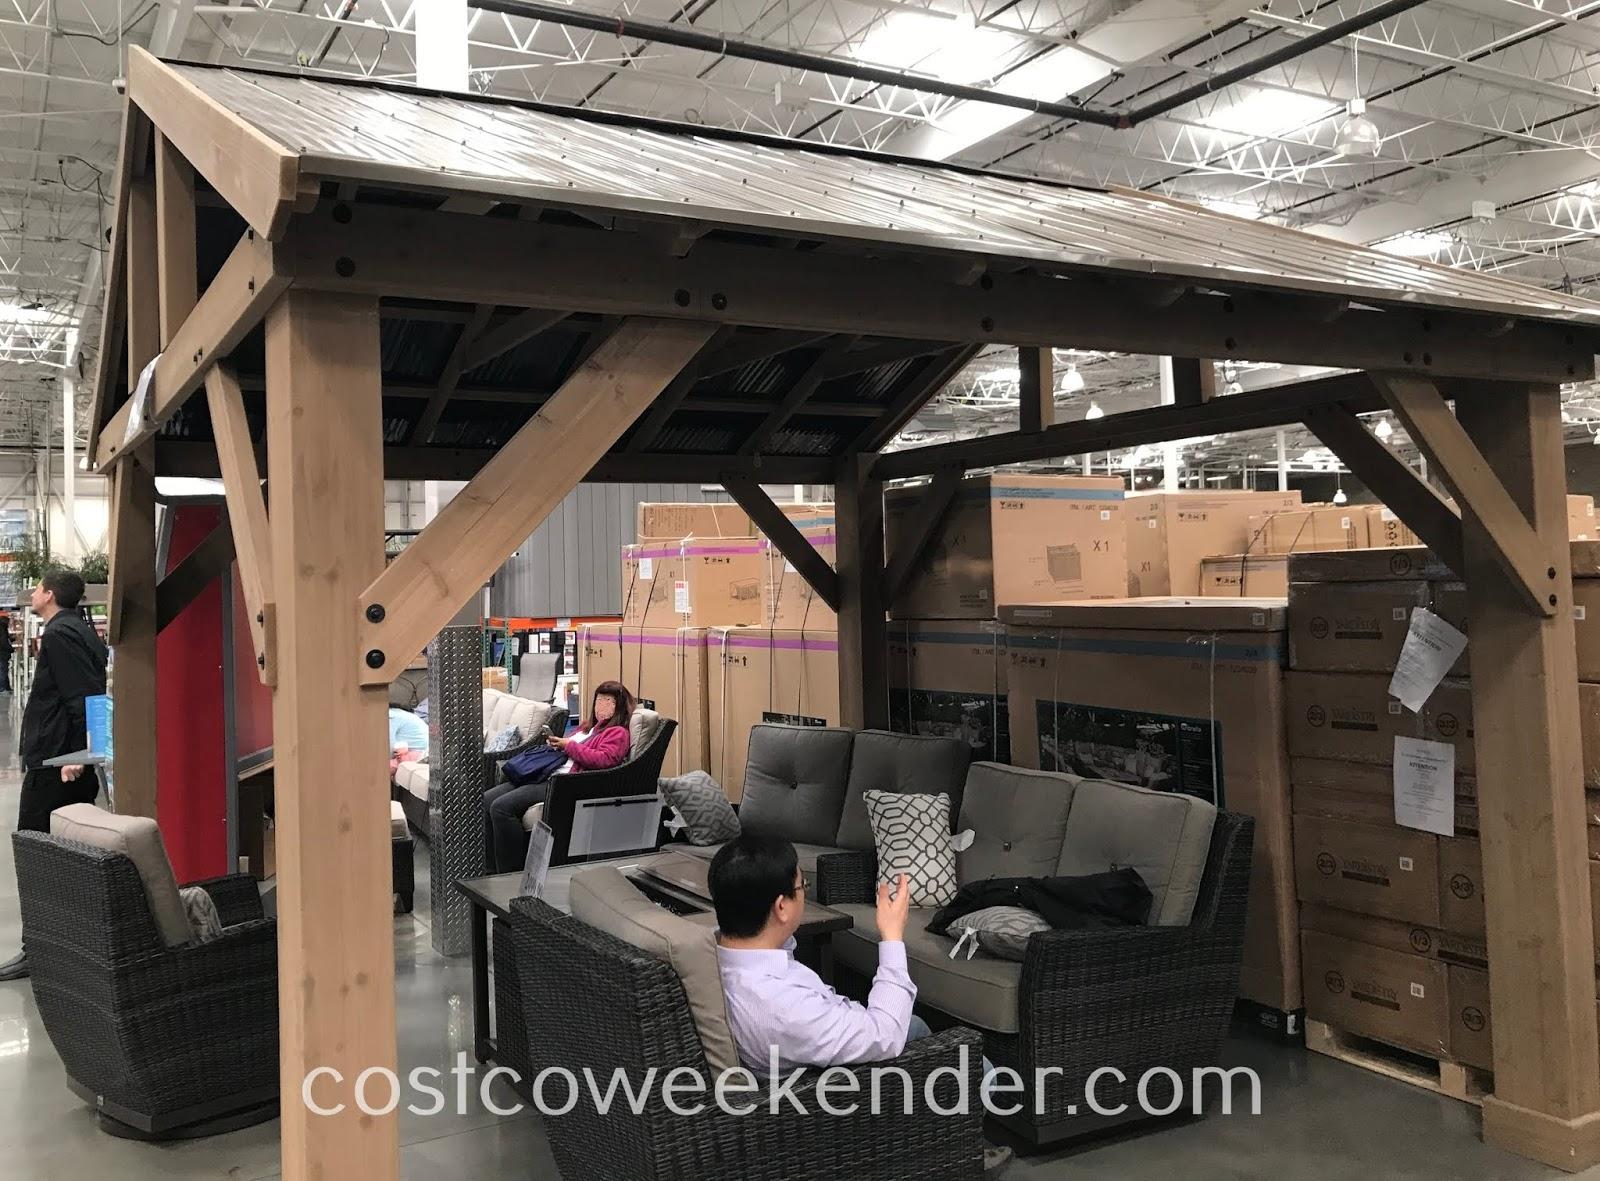 Yardistry Cedar Wood Pavilion with Aluminum Roof | Costco ... on Yardistry Backyard Pavilion id=53628